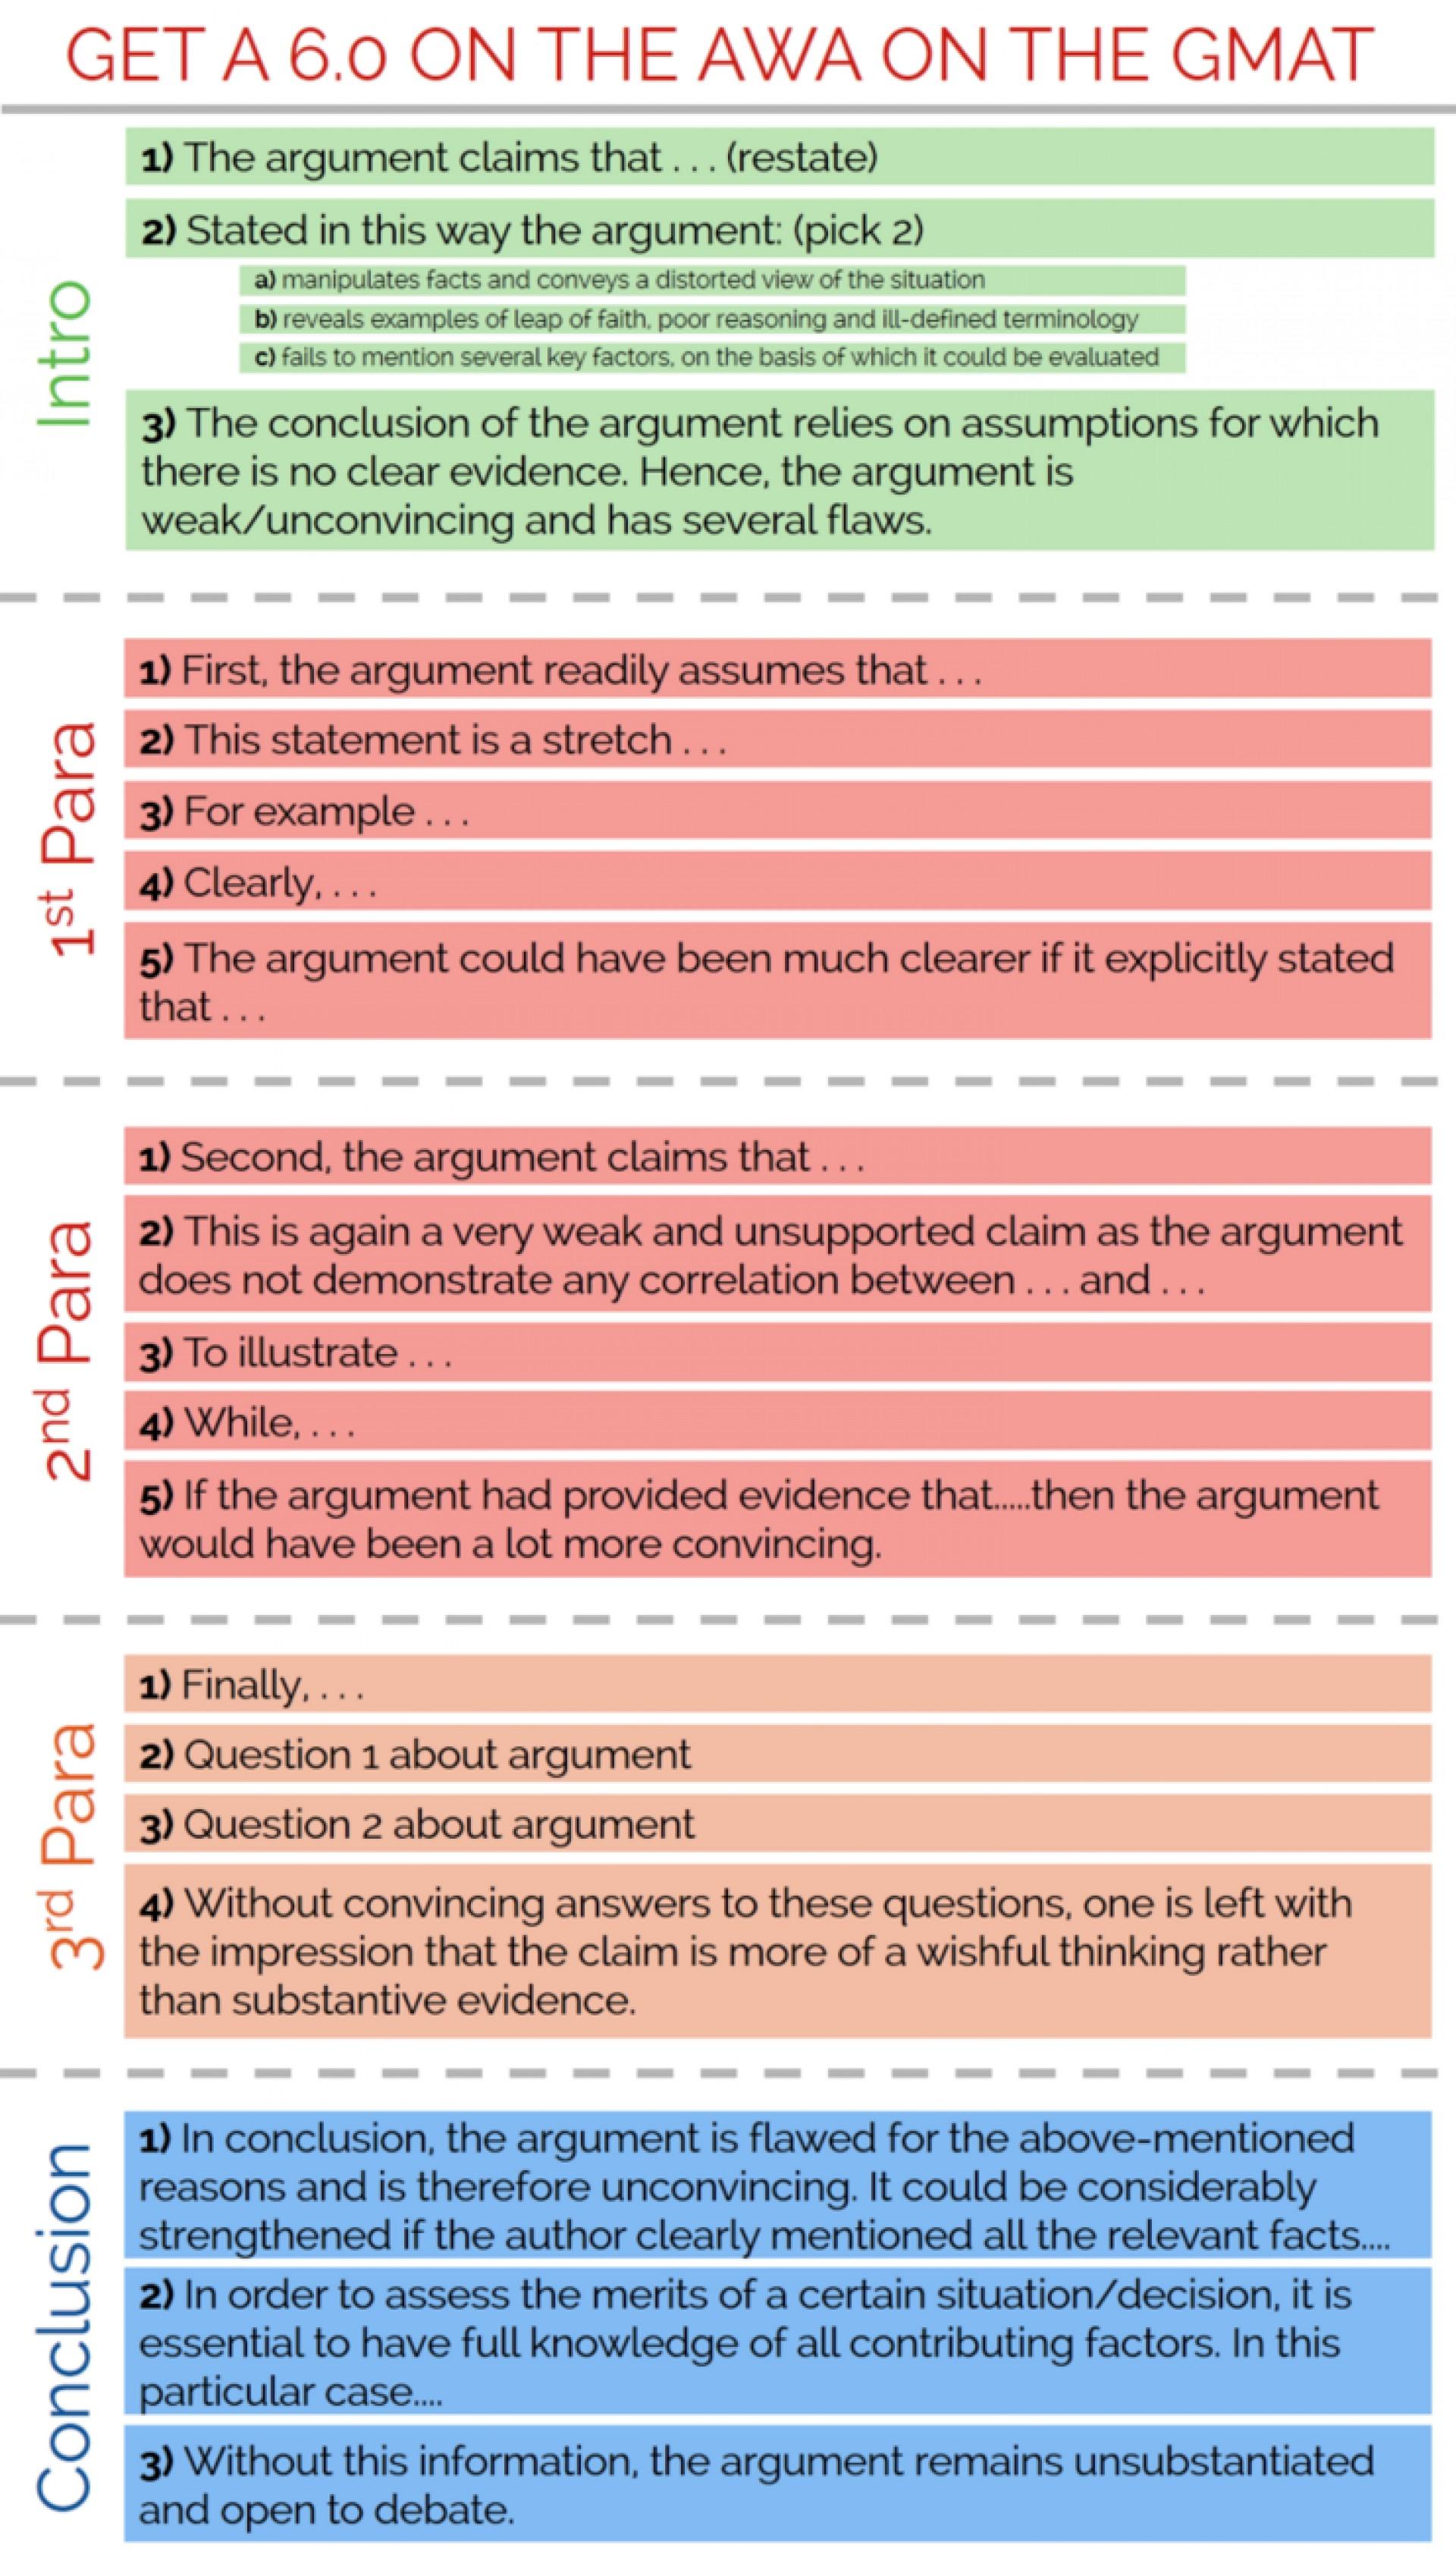 019 Gre Argument Essay Template Gdxgsga1 Frightening Sample Solution Samples Pdf 1920